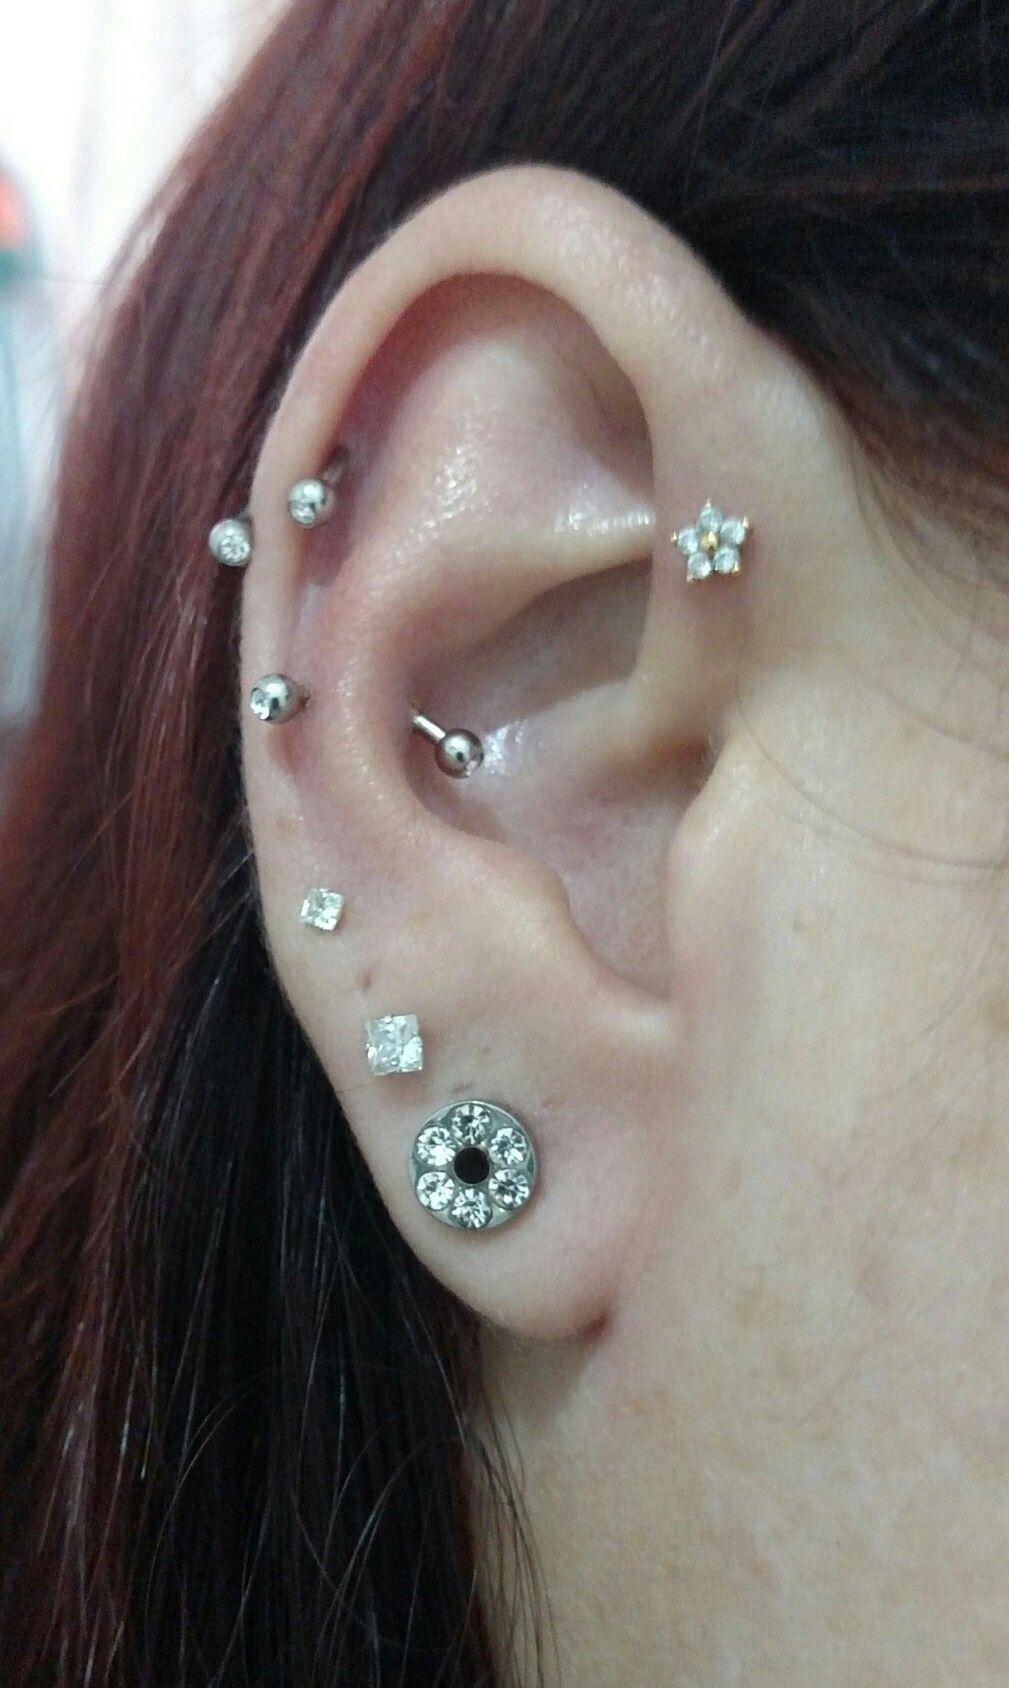 Nose piercing through the middle  Meu novo Snog e Helix flor  Piercings  Pinterest  Piercings